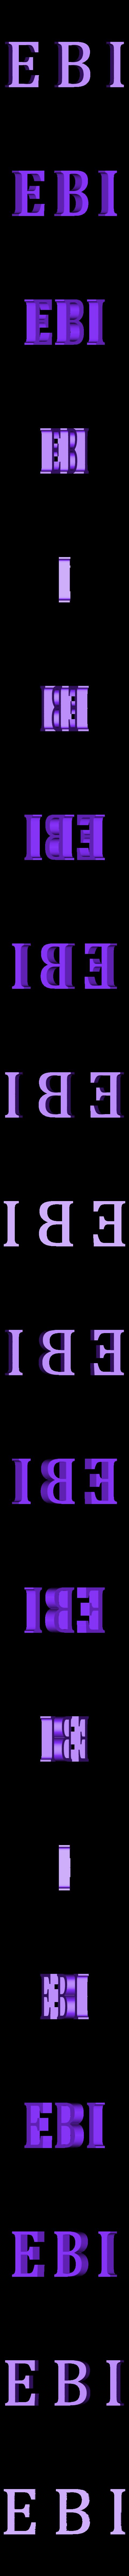 Break_EBI_01.stl Download free STL file The Magicians - Brakebills University Logo • 3D printing template, SYFY